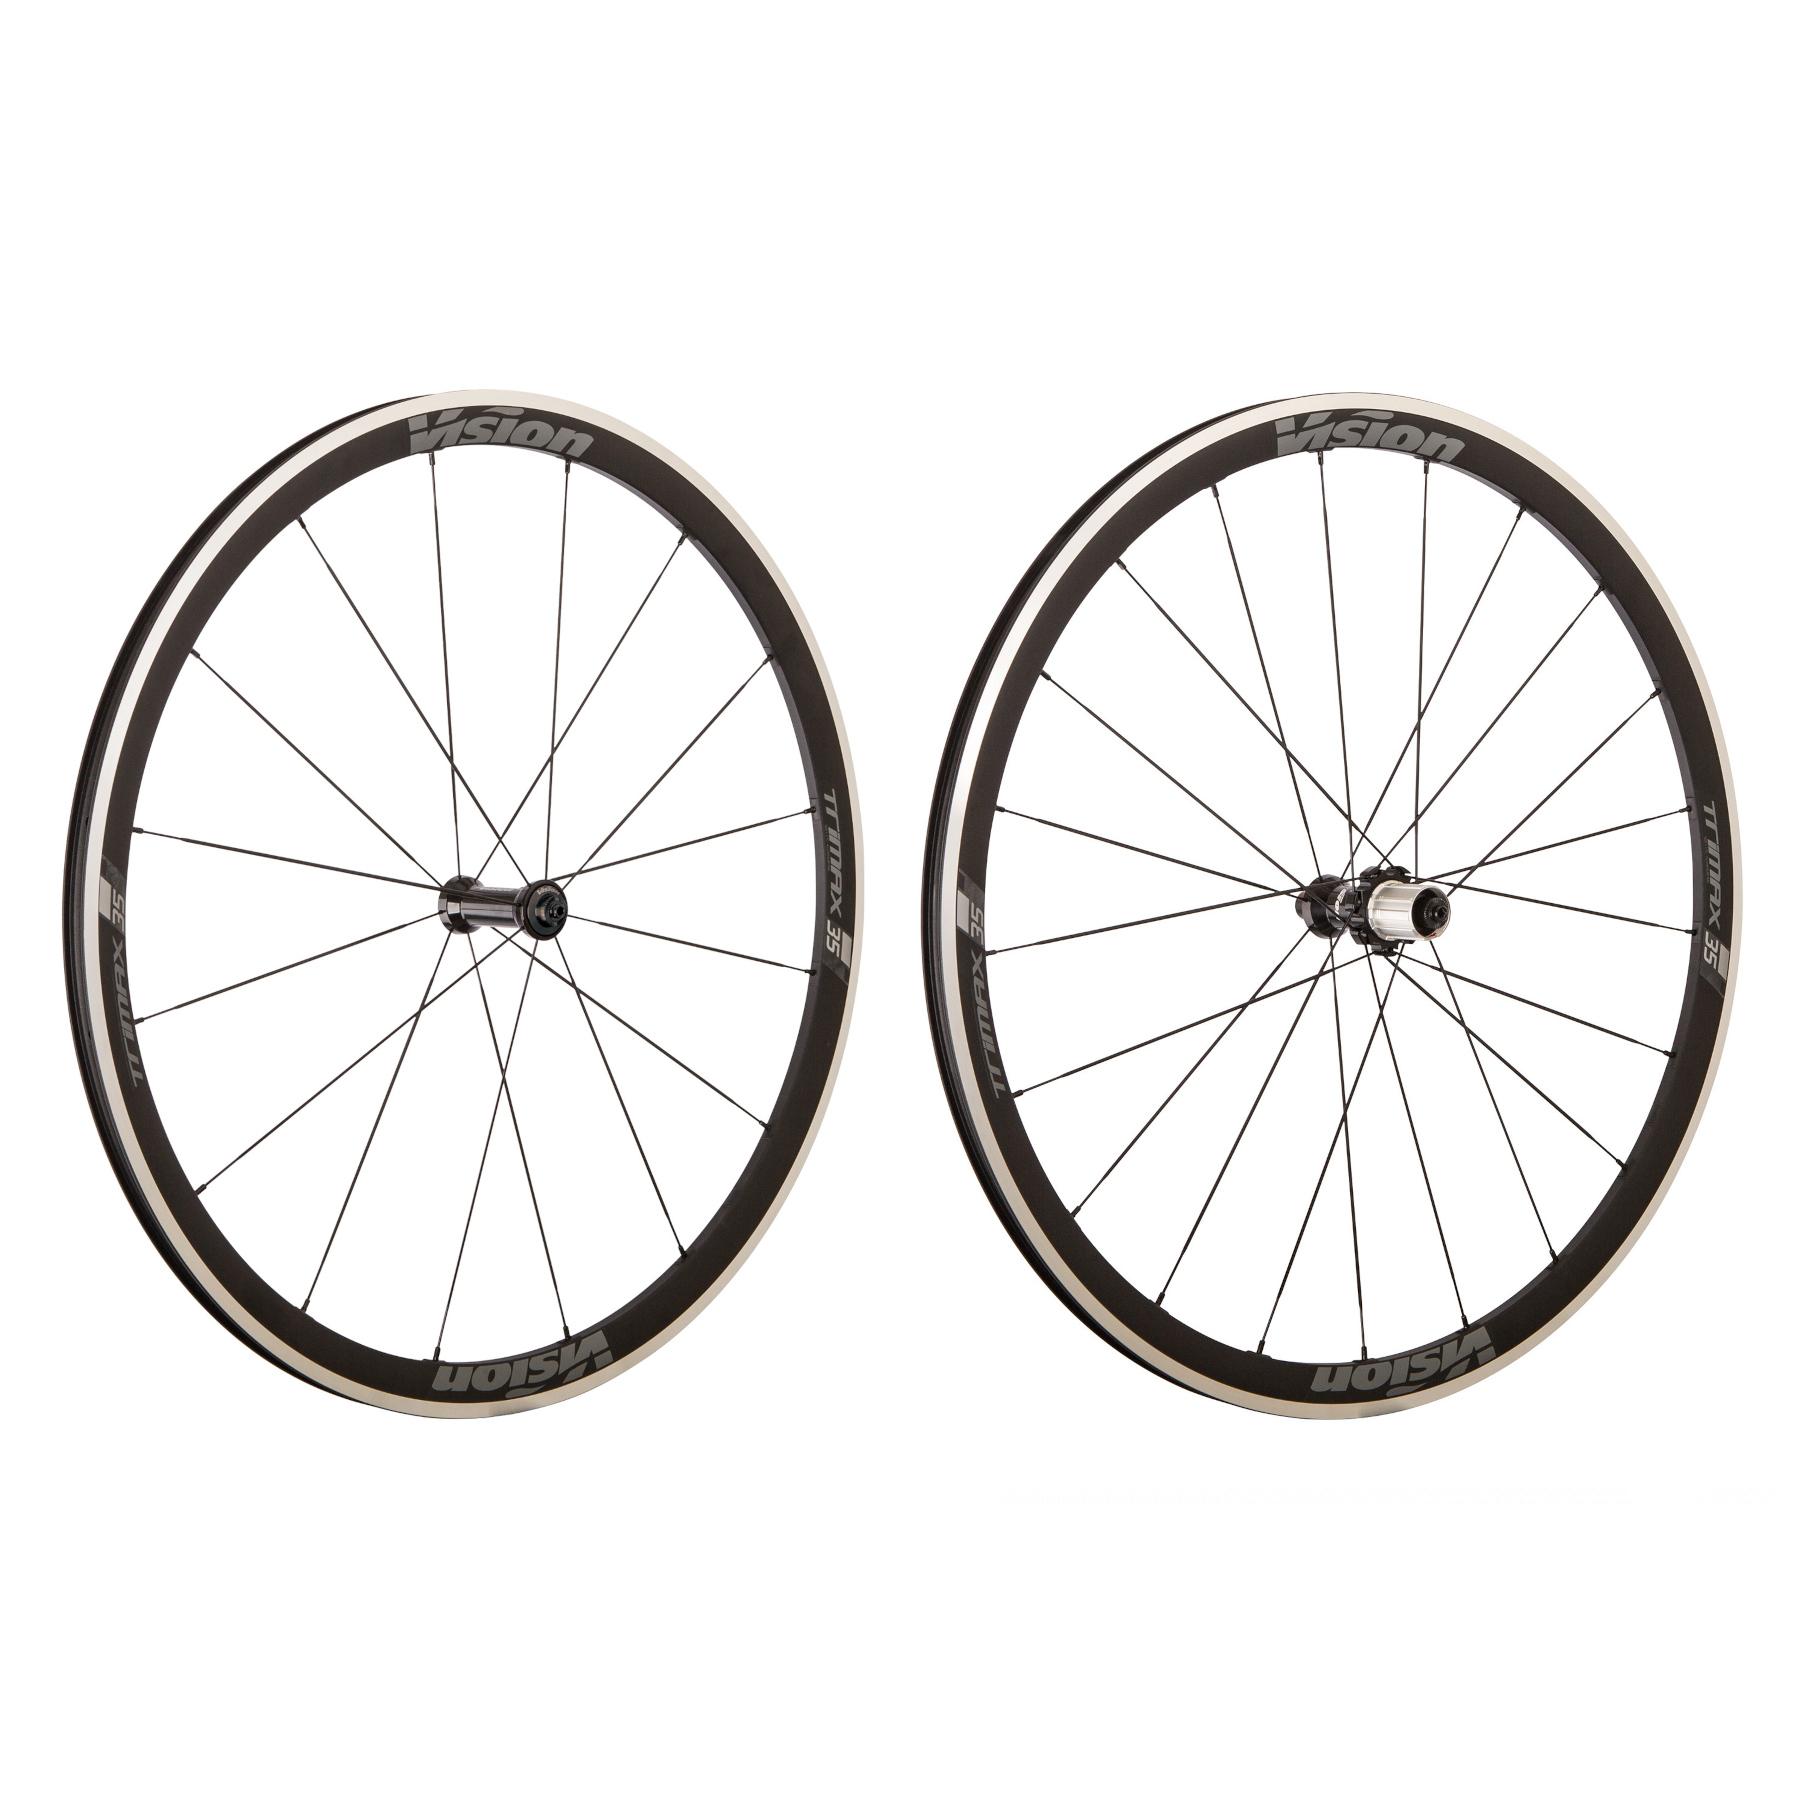 Vision Trimax 35 RB Laufradsatz - Drahtreifen / Tubeless - QR 100/130 - Shimano HG